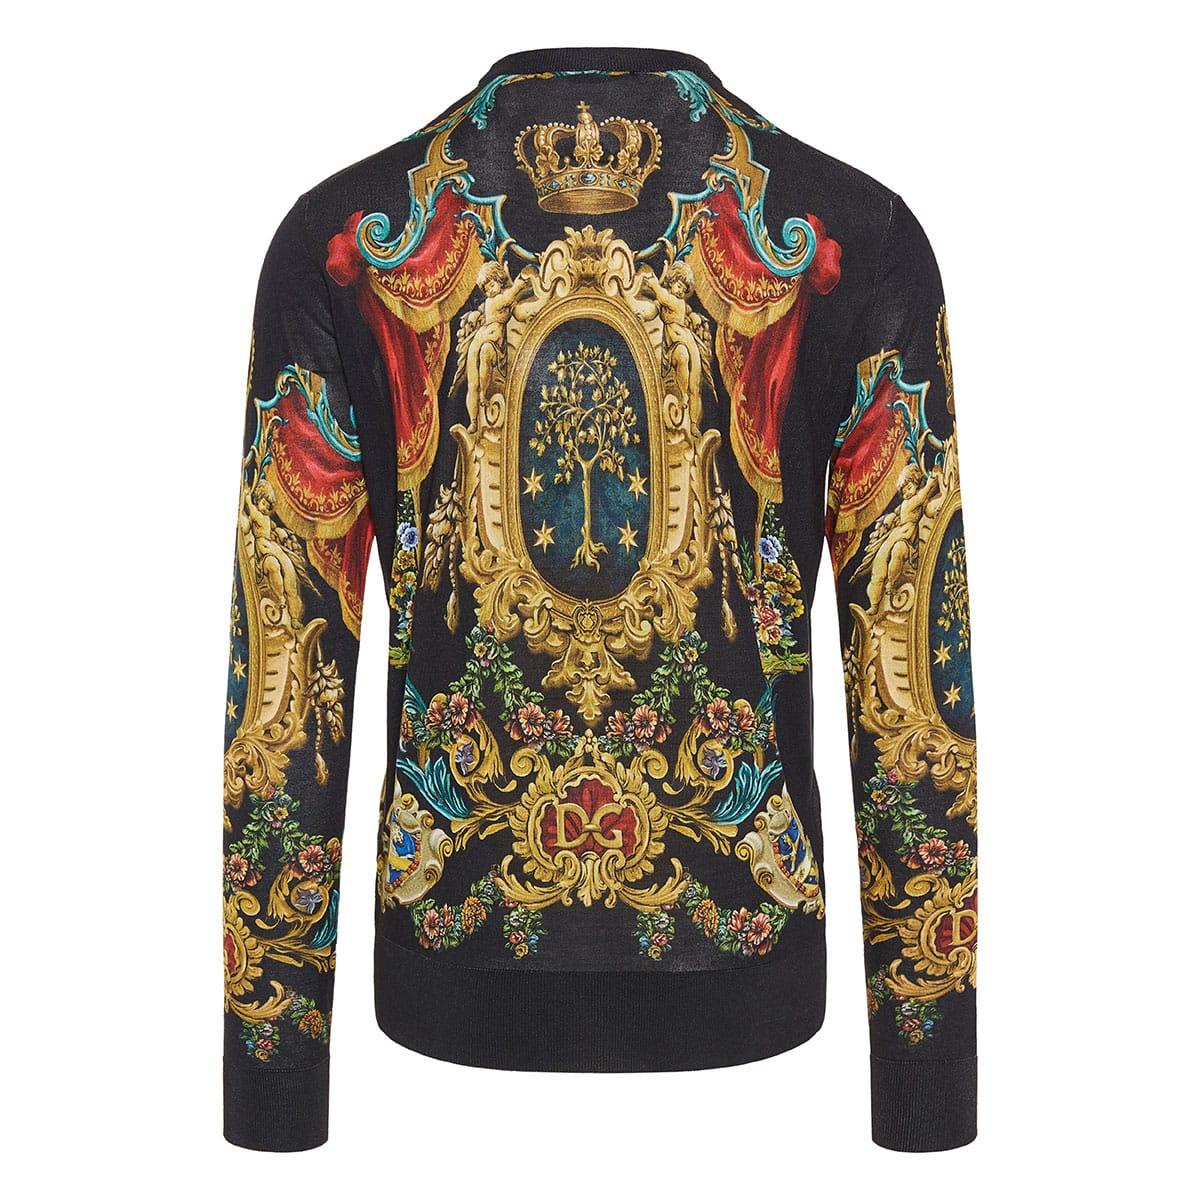 Printed silk sweater